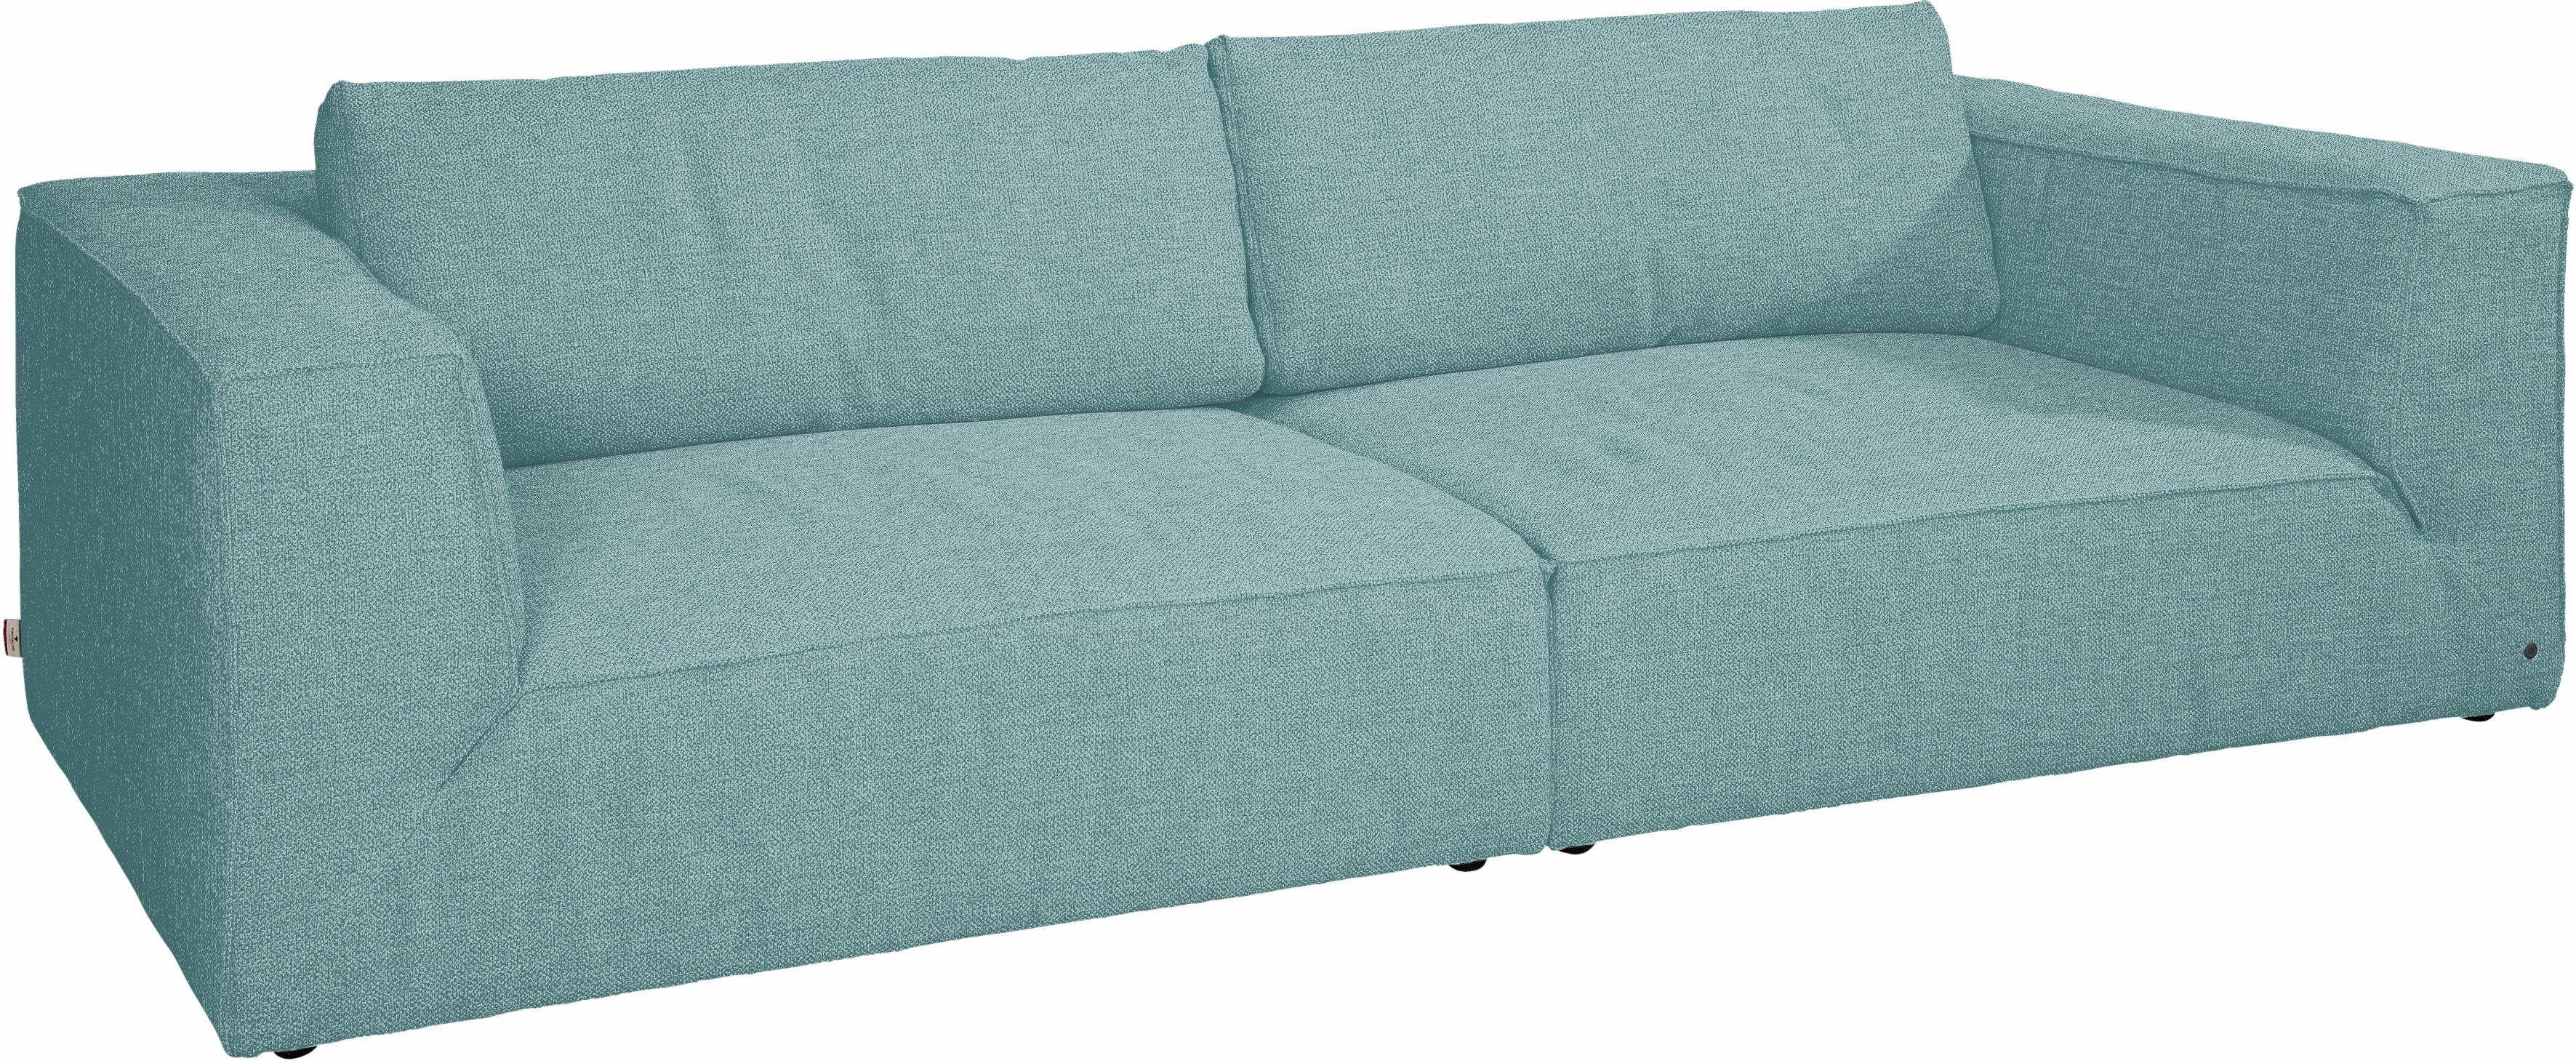 Tom Tailor Big Sofa Blau Big Cube Style Jetzt Bestellen Unter